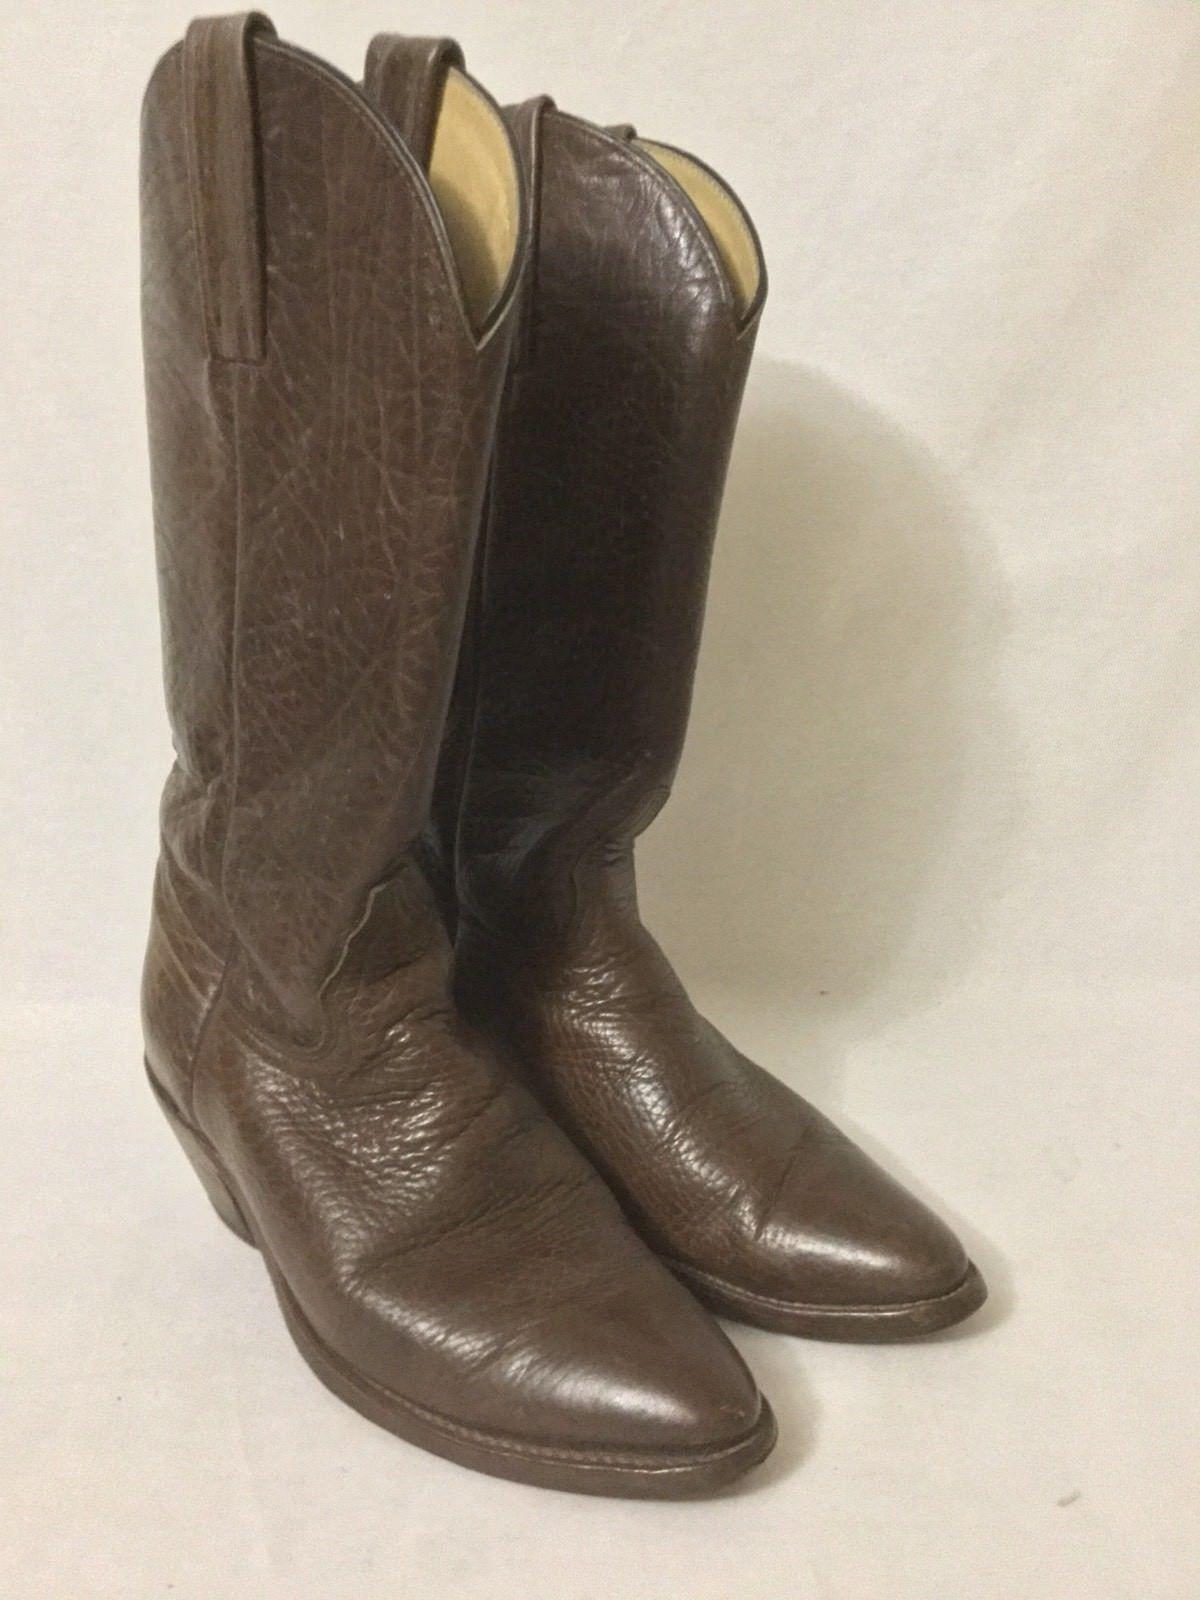 Vintage frye brown cowboy western stivali Uomo boot boot Uomo scorpe 7 d 9c1d73